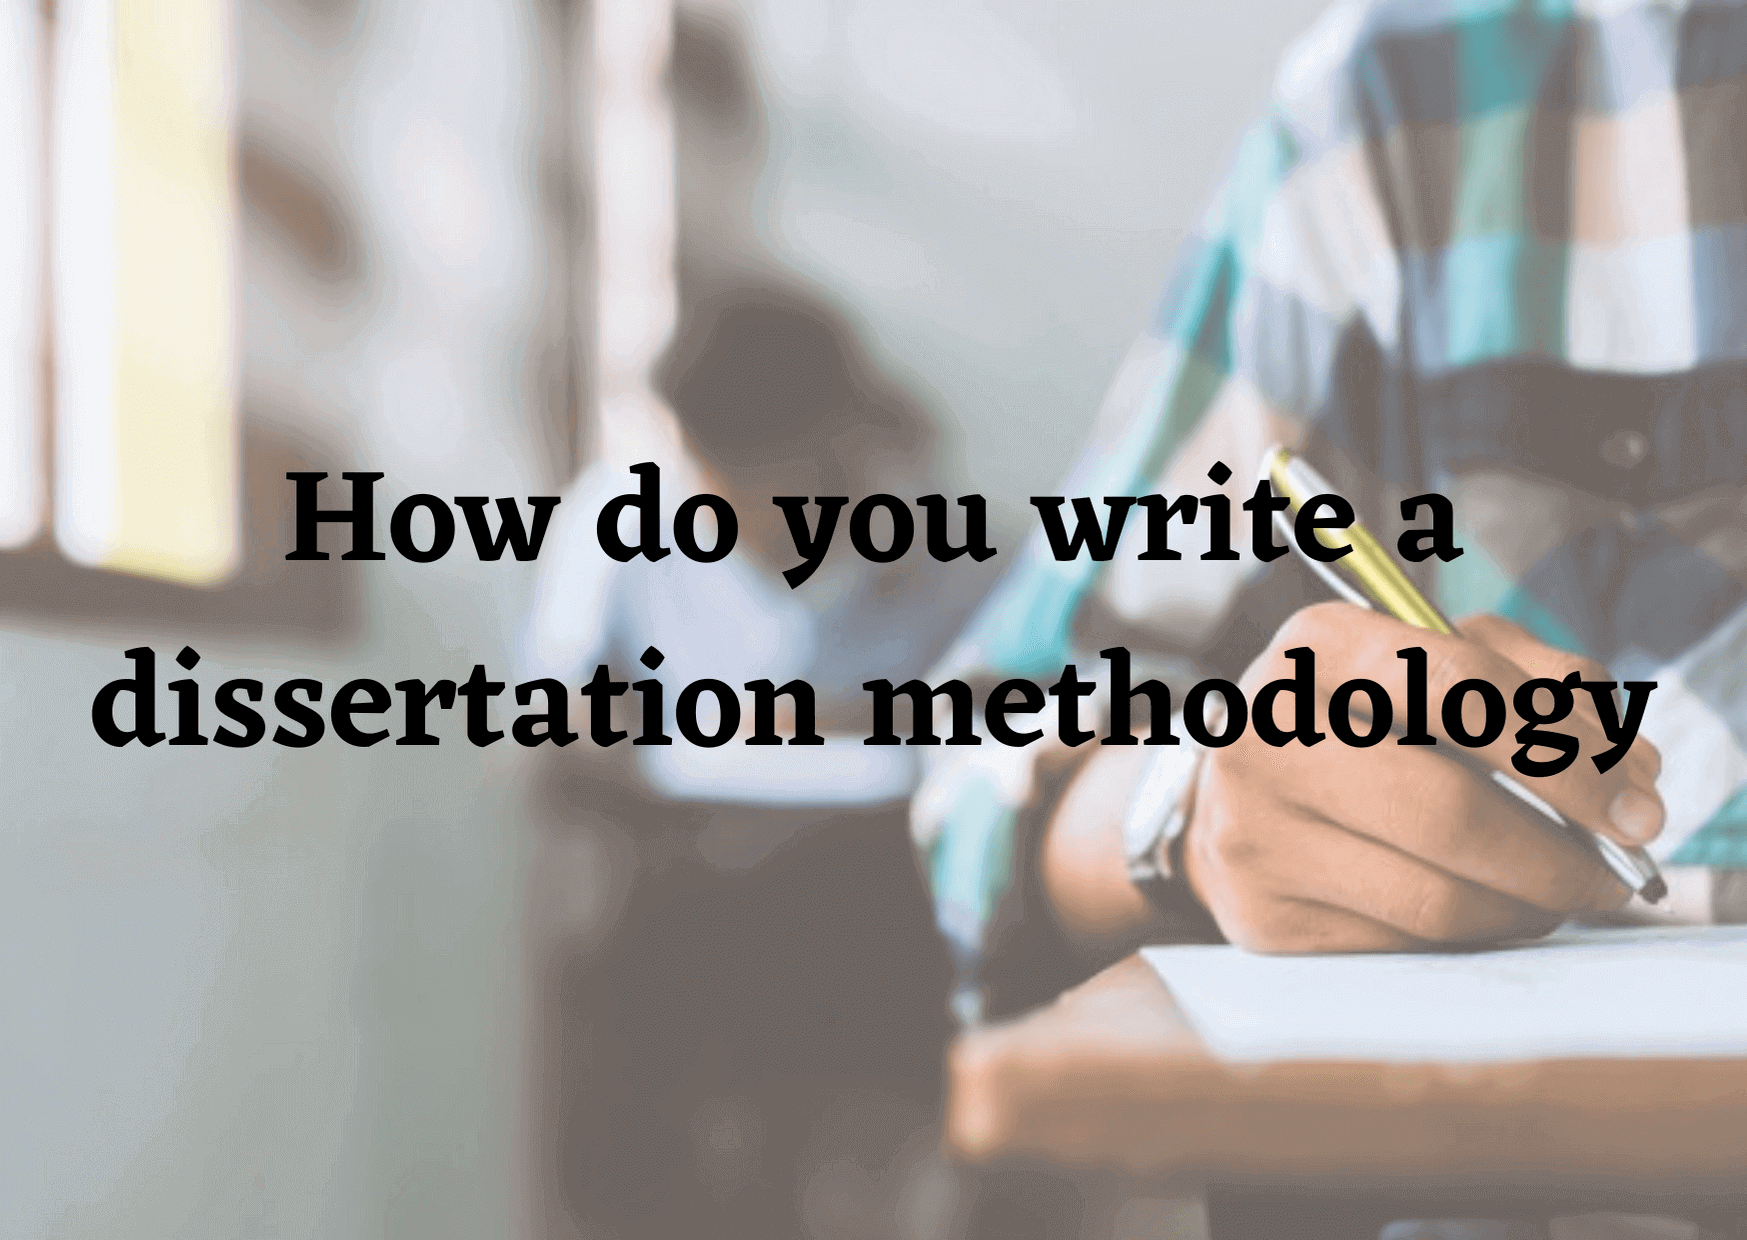 How-do-you-write-a-dissertation-methodology